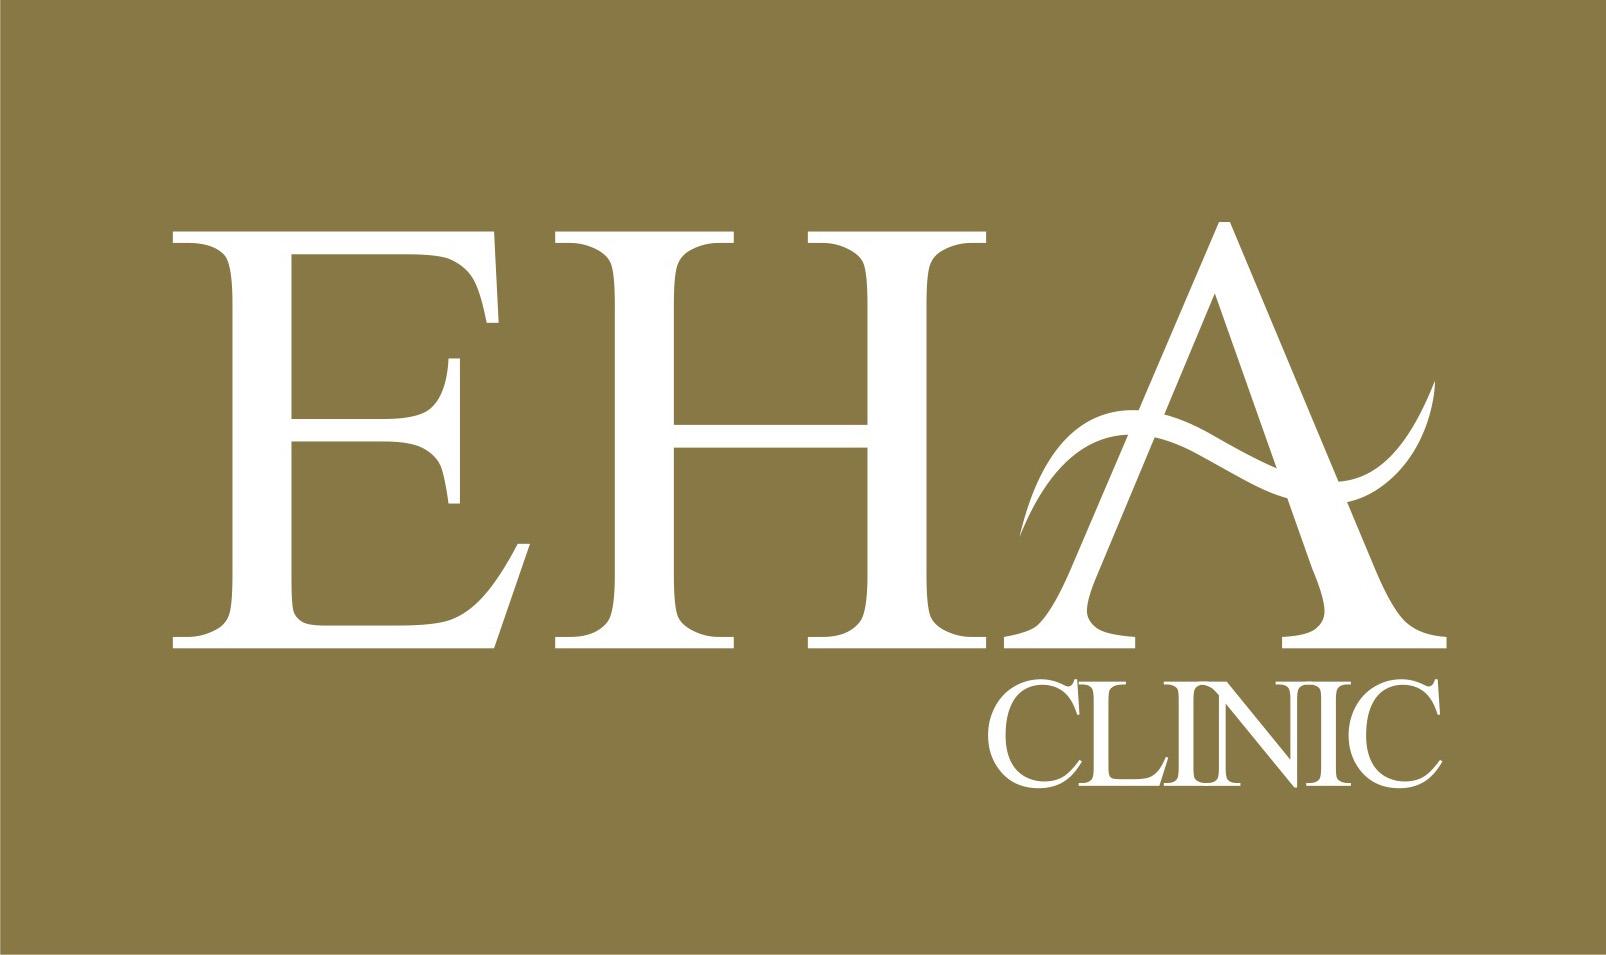 EHA_Clinic_logo.jpg